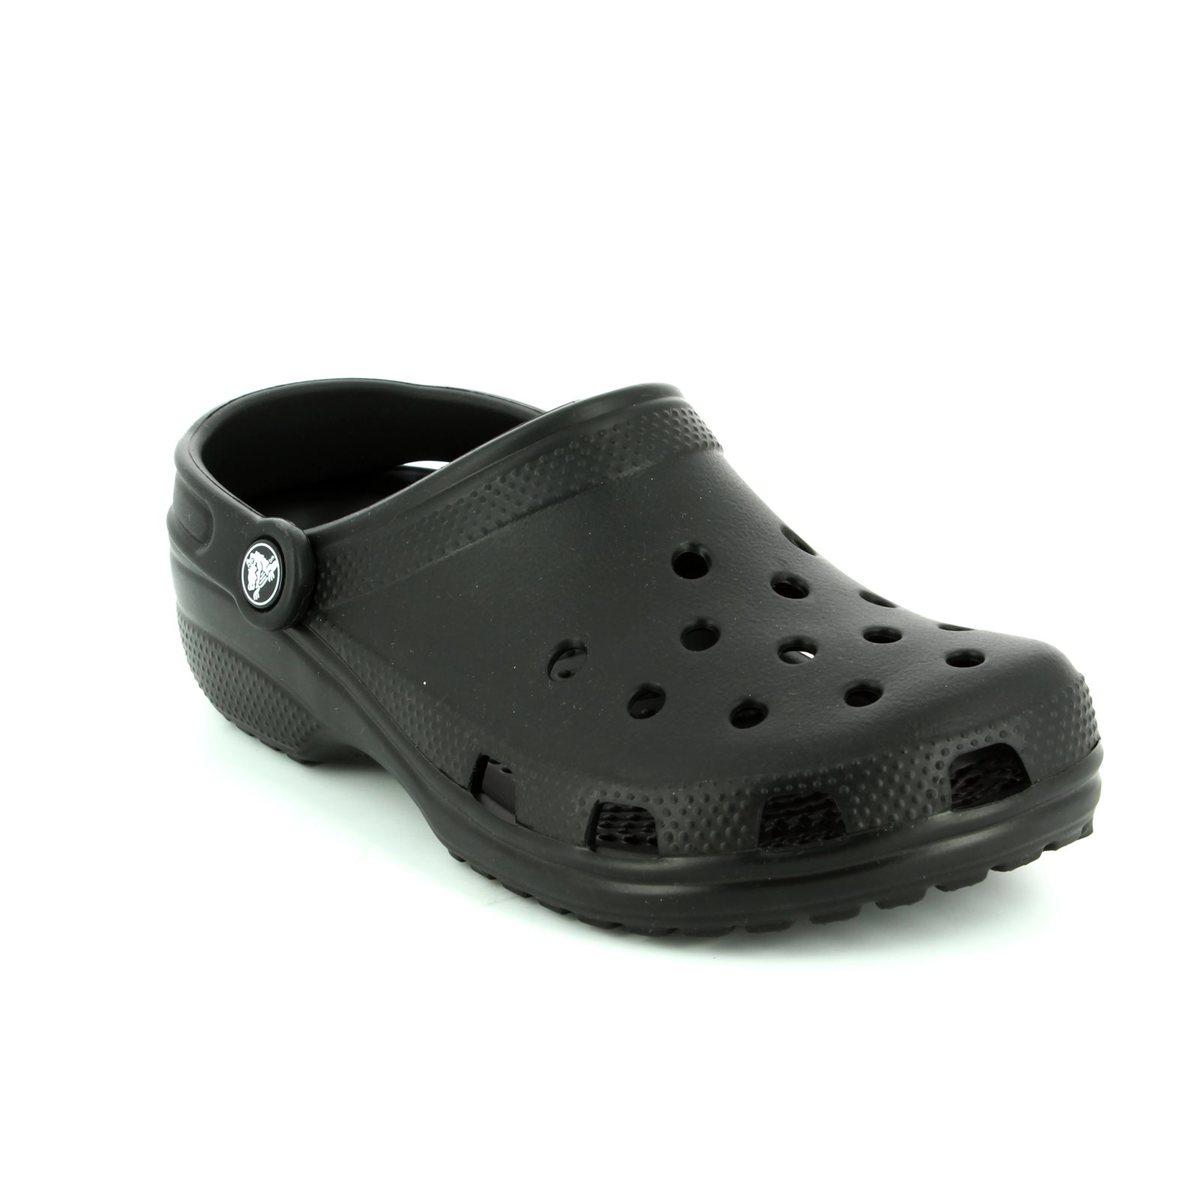 773acdbd39710a Crocs Mens  amp  Womens - Black - 10001 001 CLASSIC